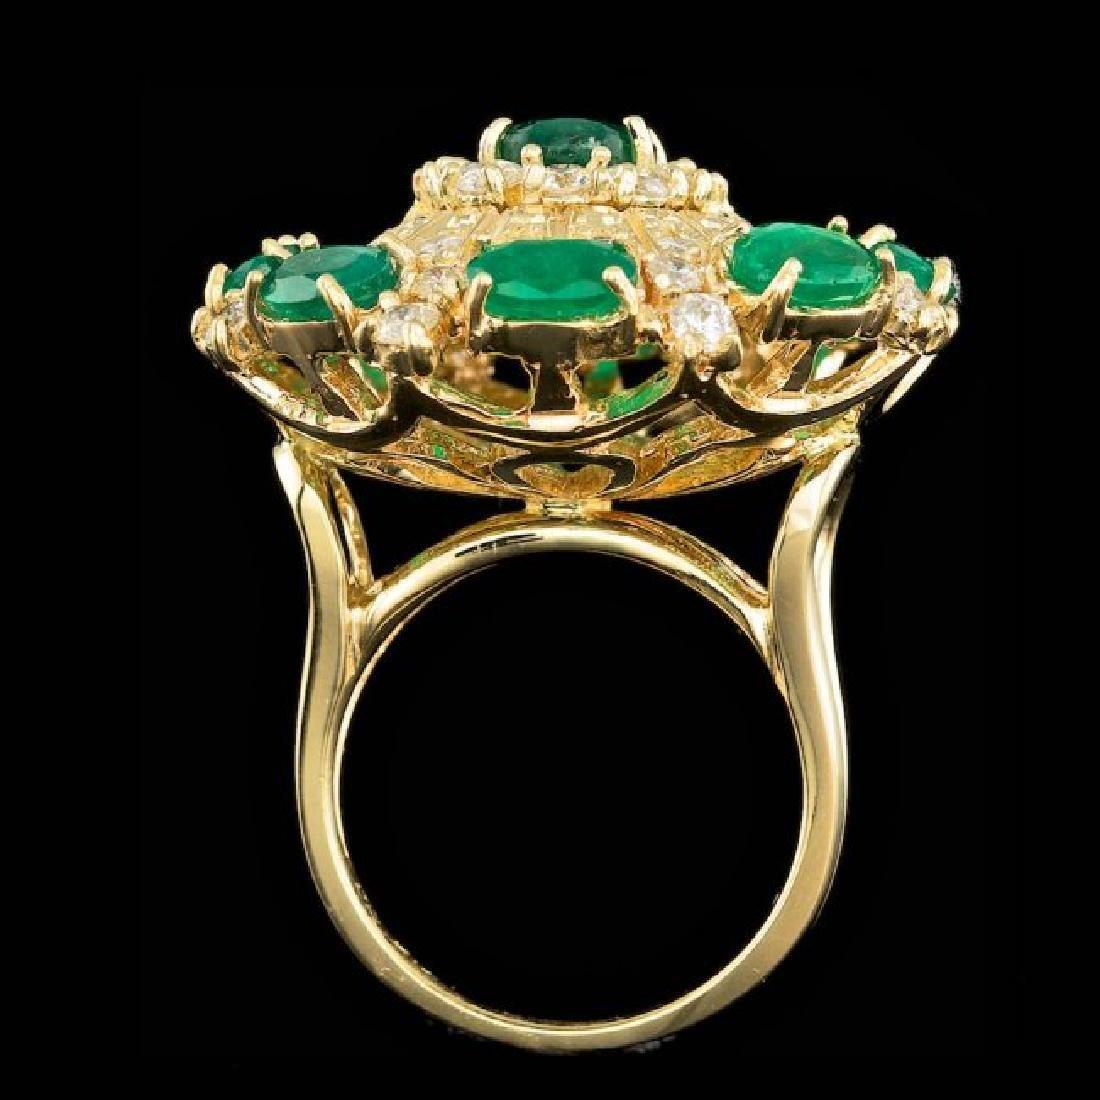 14k Gold 5.00ct Emerald 2.00ct Diamond Ring - 3